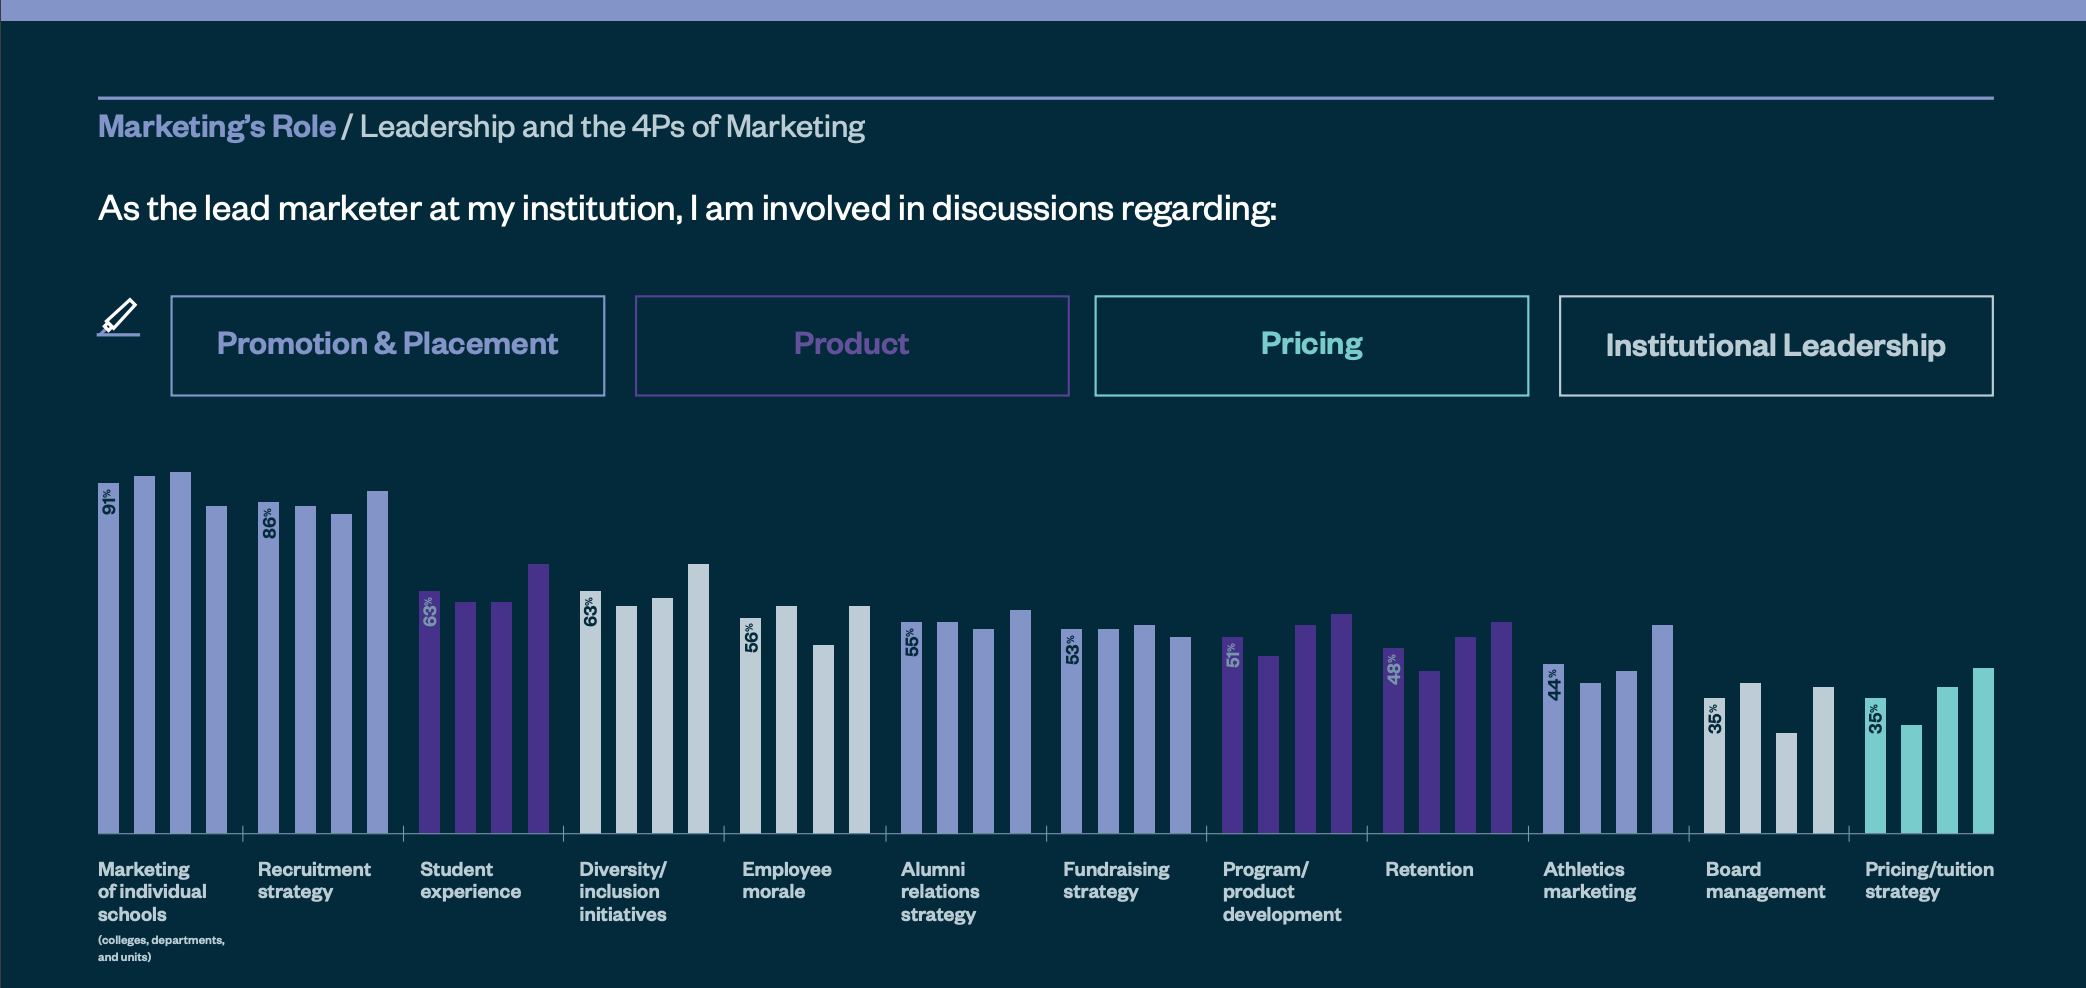 Chart depicting portfolio of responsibilities in higher education marketing